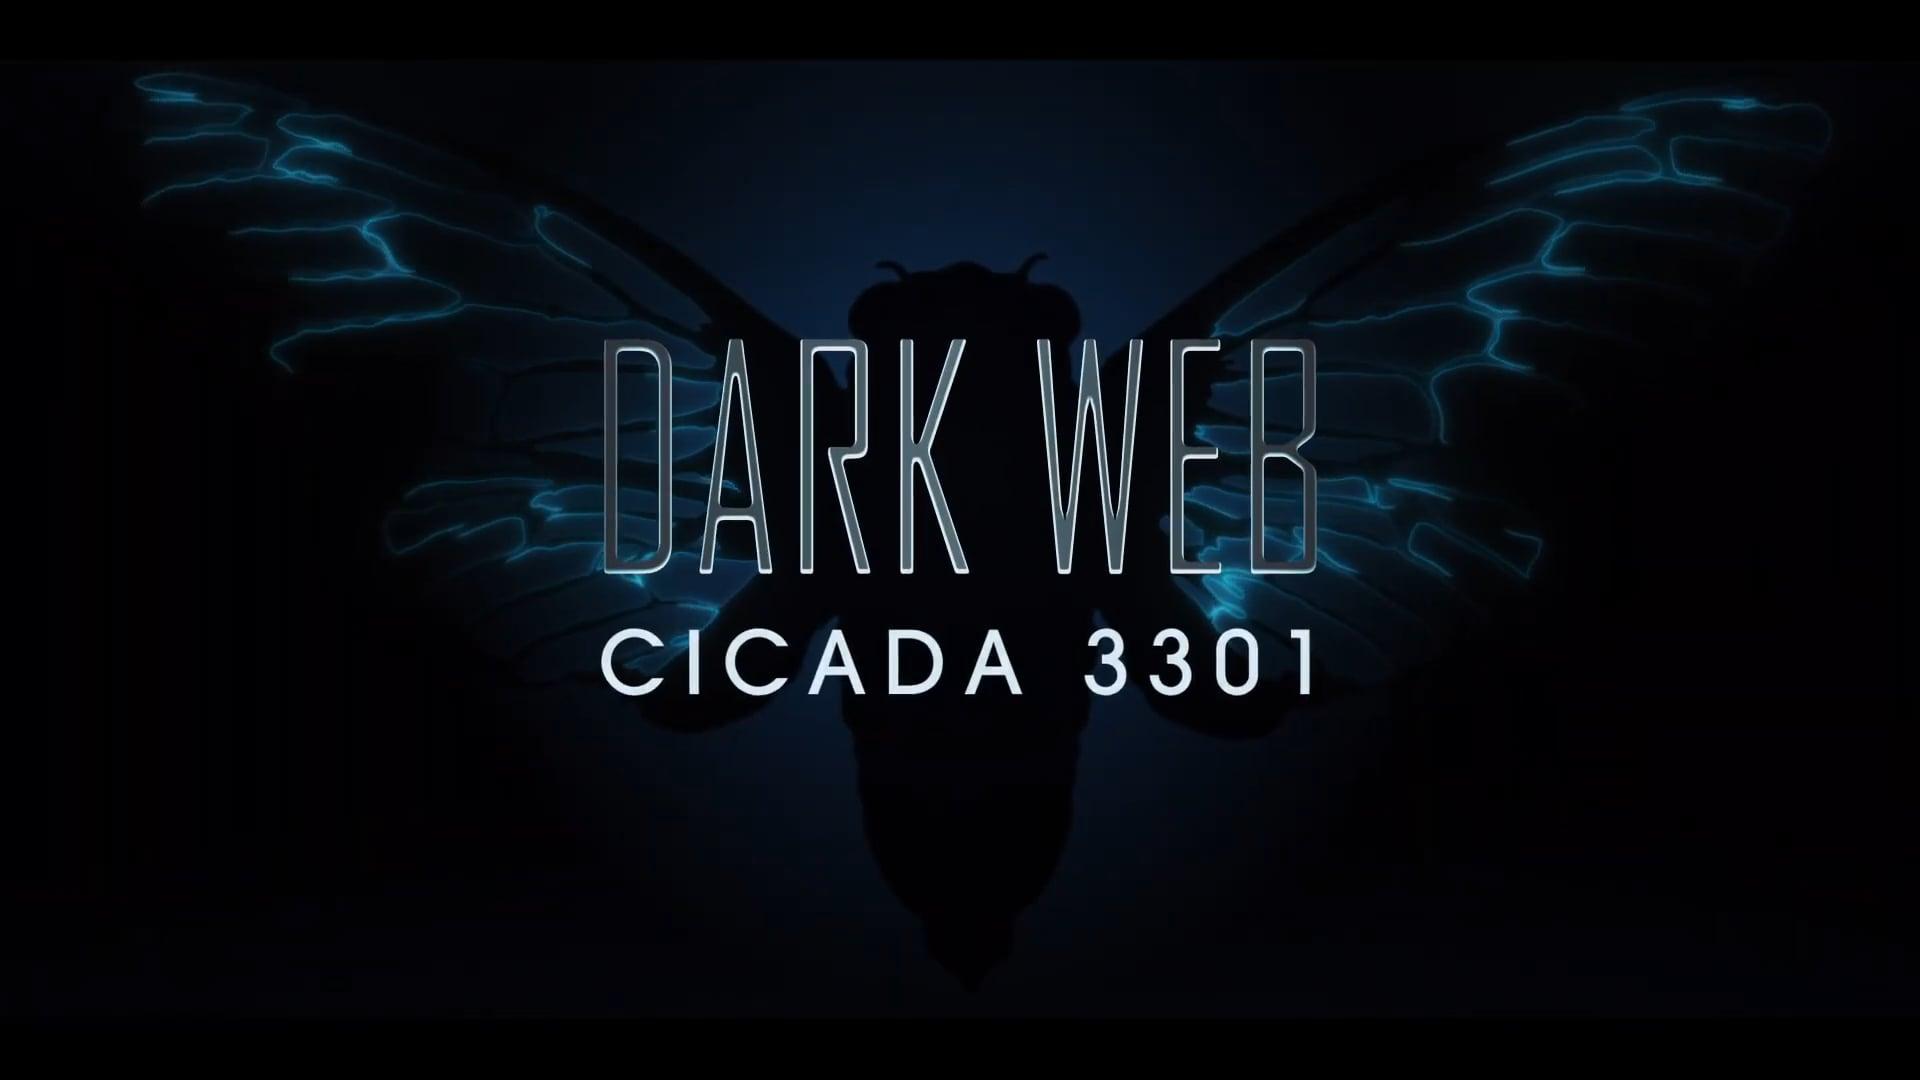 Dark Web Cicada 3301 | Lionsgate